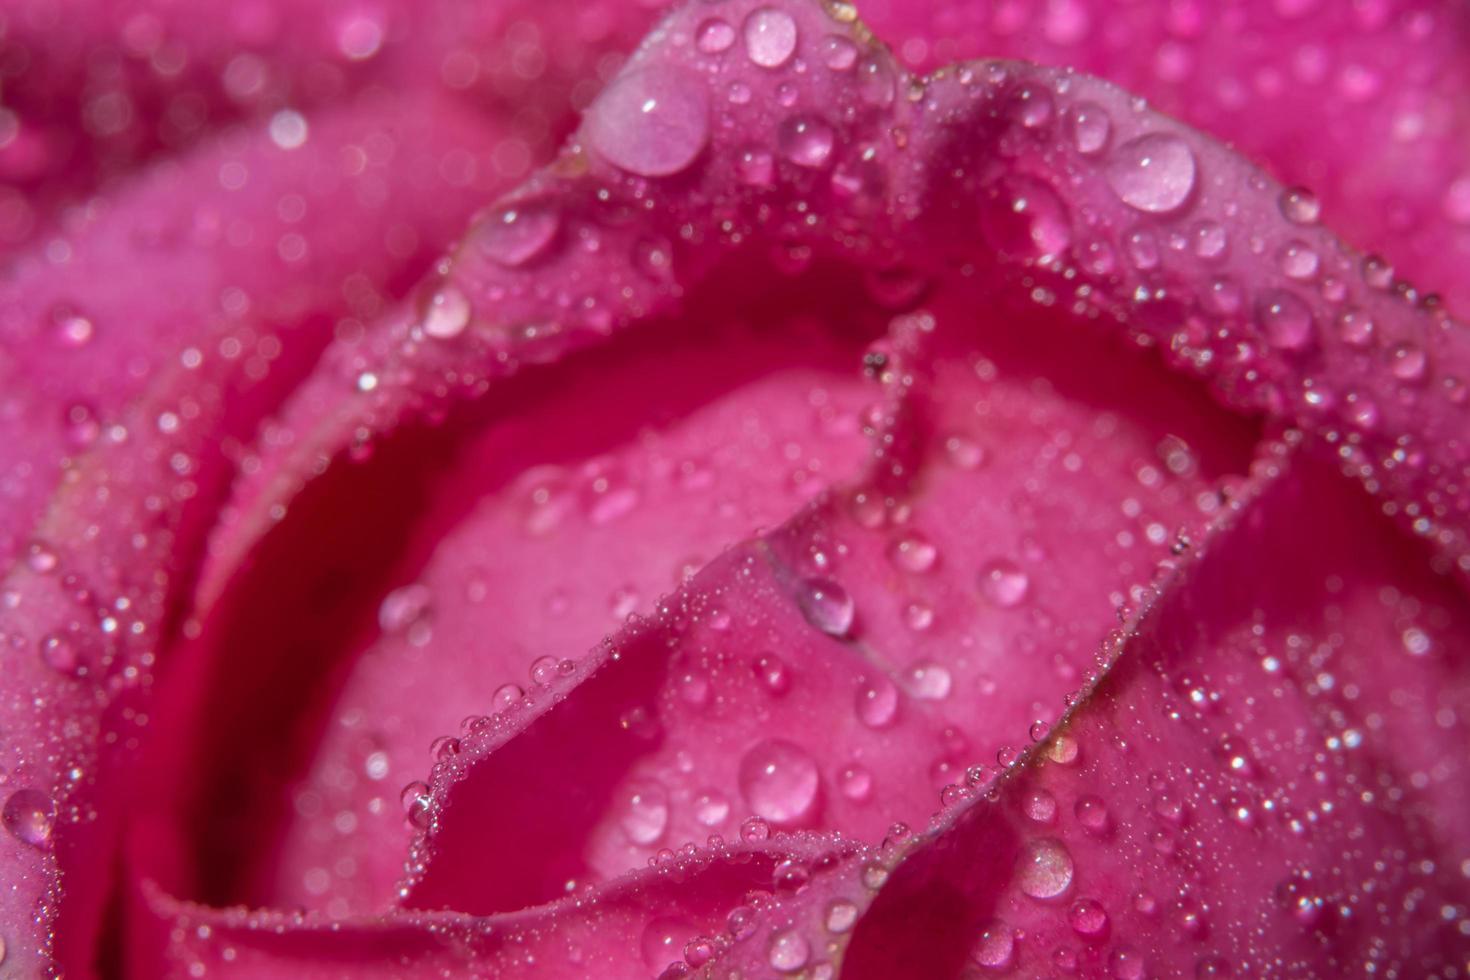 vattendroppar på rosenblad foto